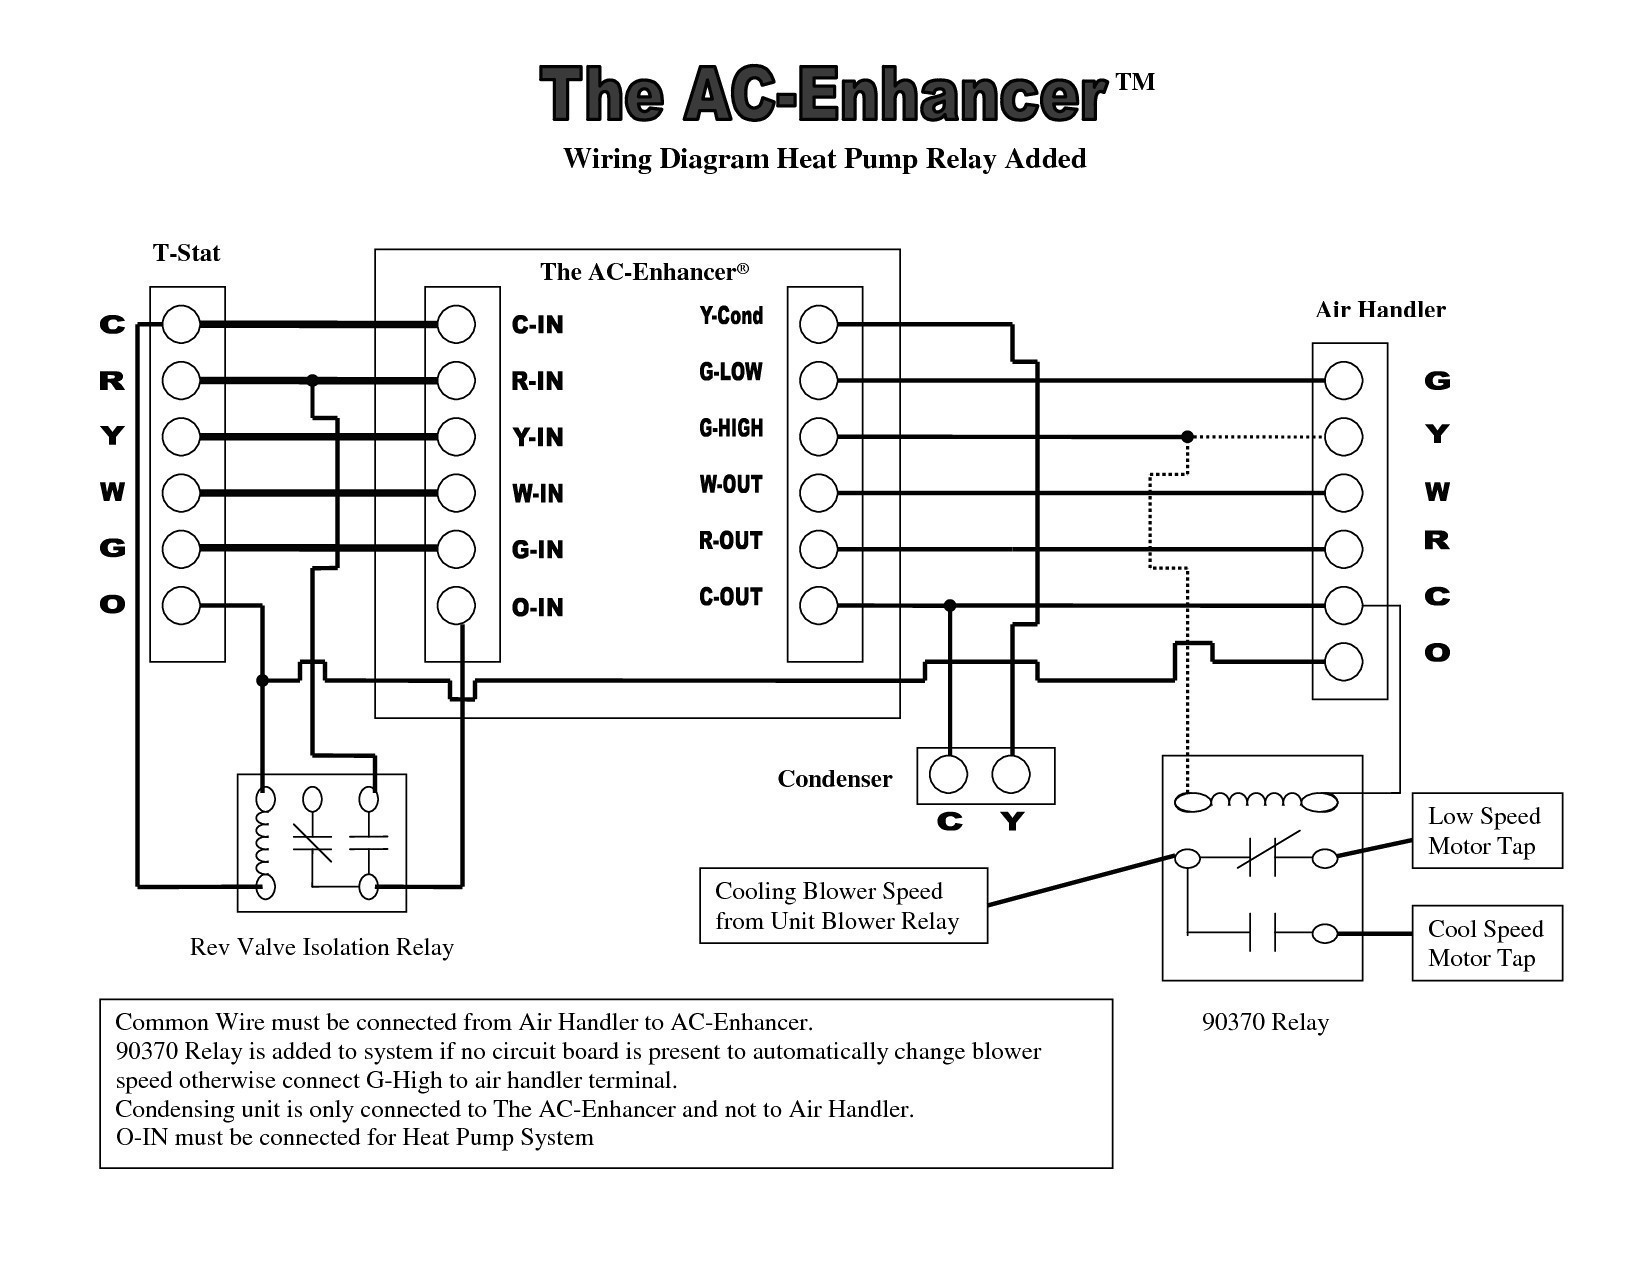 Carrier Heat Pump thermostat Wiring Diagram Carrier Heat Pump thermostat Wiring Diagram Striking Of Carrier Heat Pump thermostat Wiring Diagram